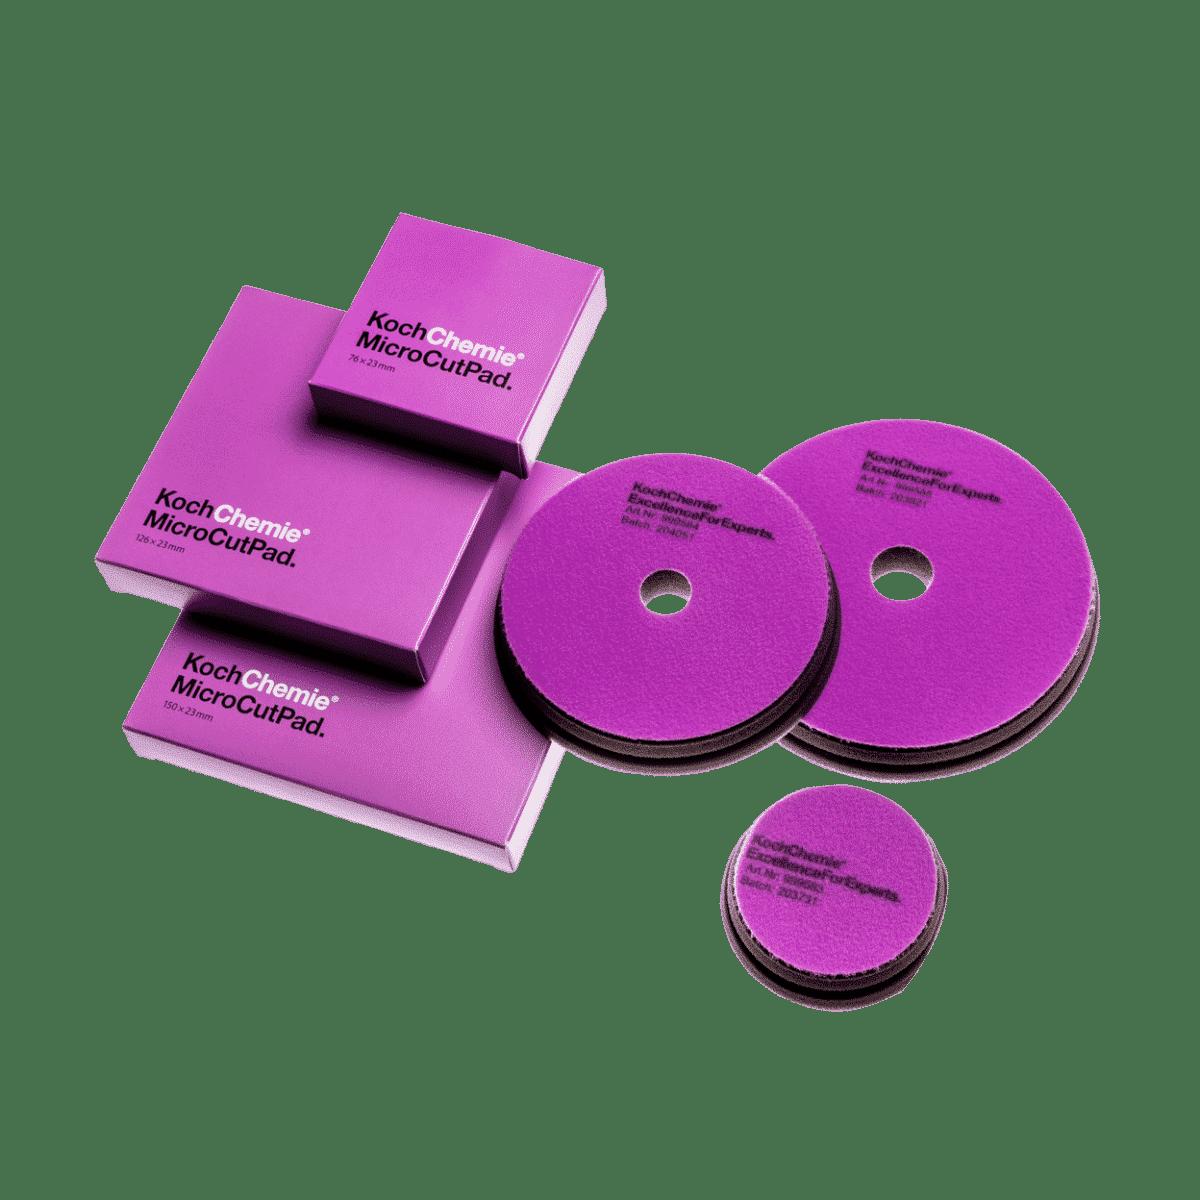 tampon de polissage micro cut pad Koch Chemie France